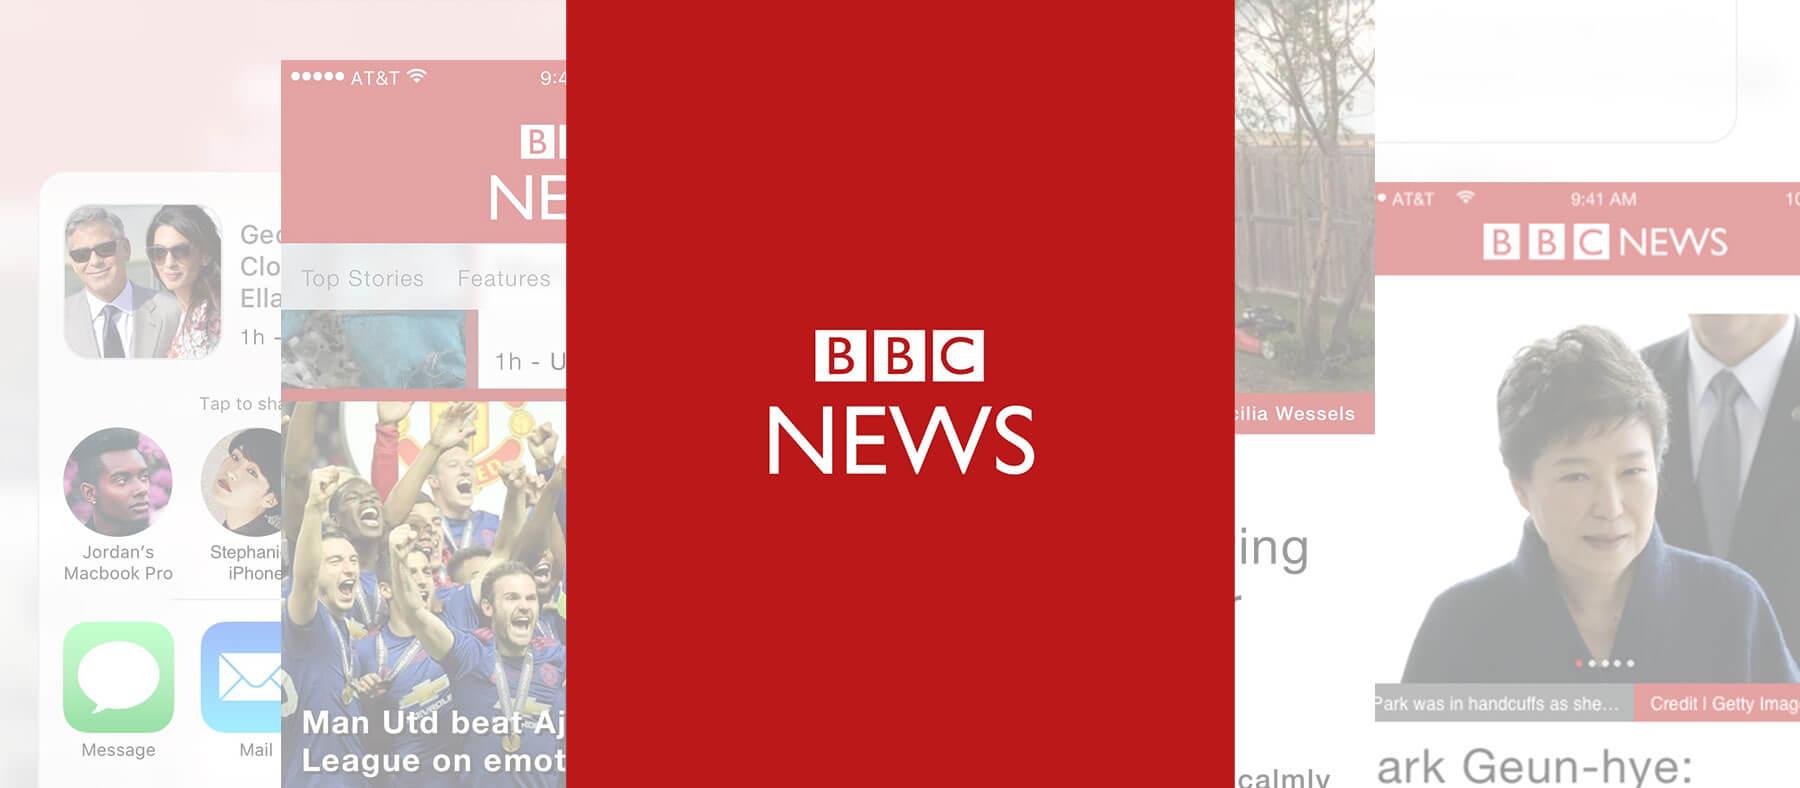 BBC_HeroImage.jpg